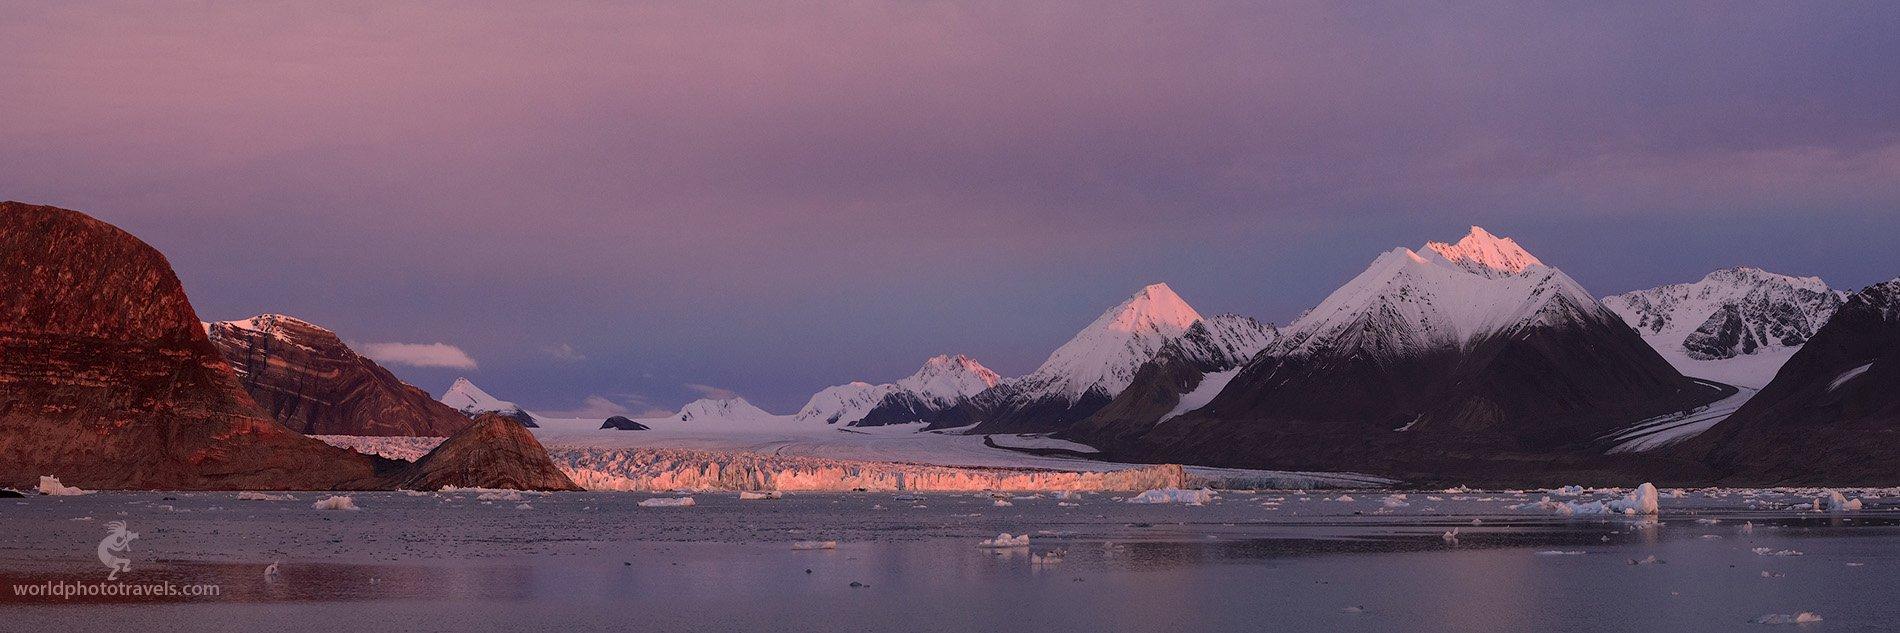 kongsfjorden., kongsvegen., norway., spitsbergen., svalbard., worldphototravels, Майк Рейфман